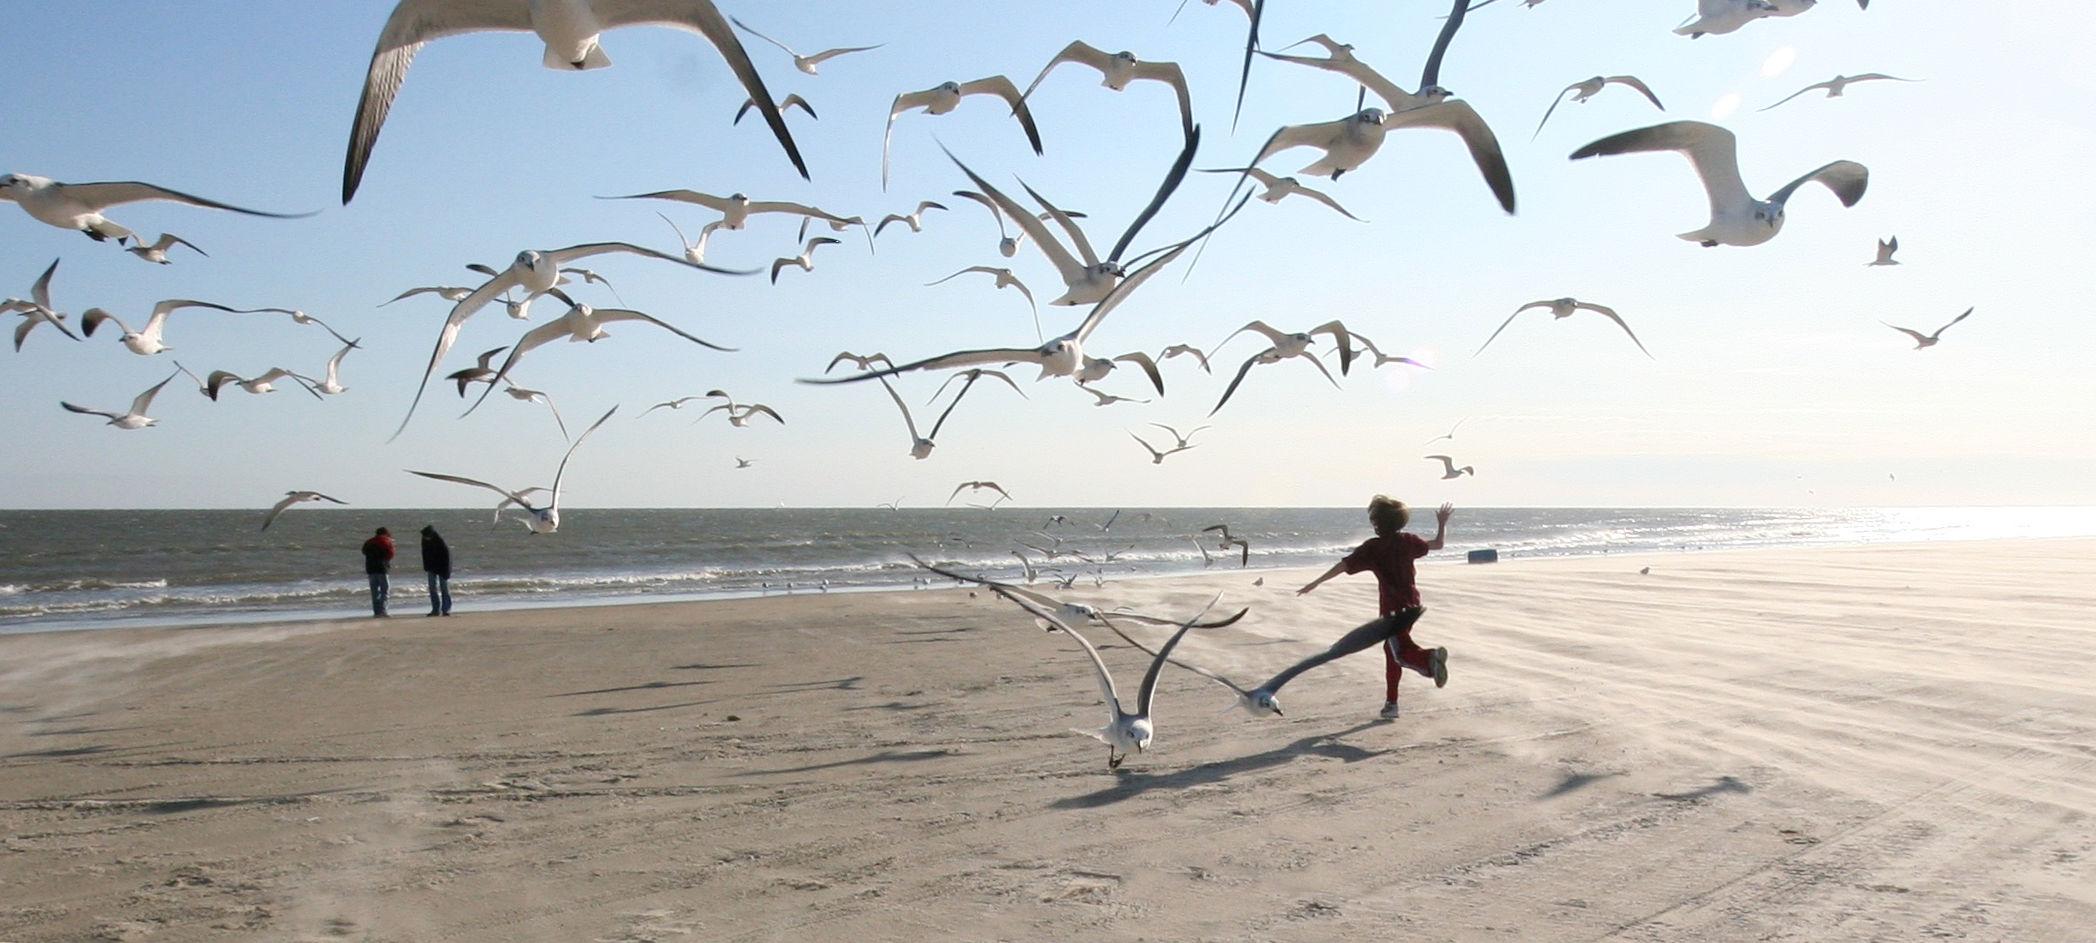 Flock_of_Seagulls_eschipul_compressed